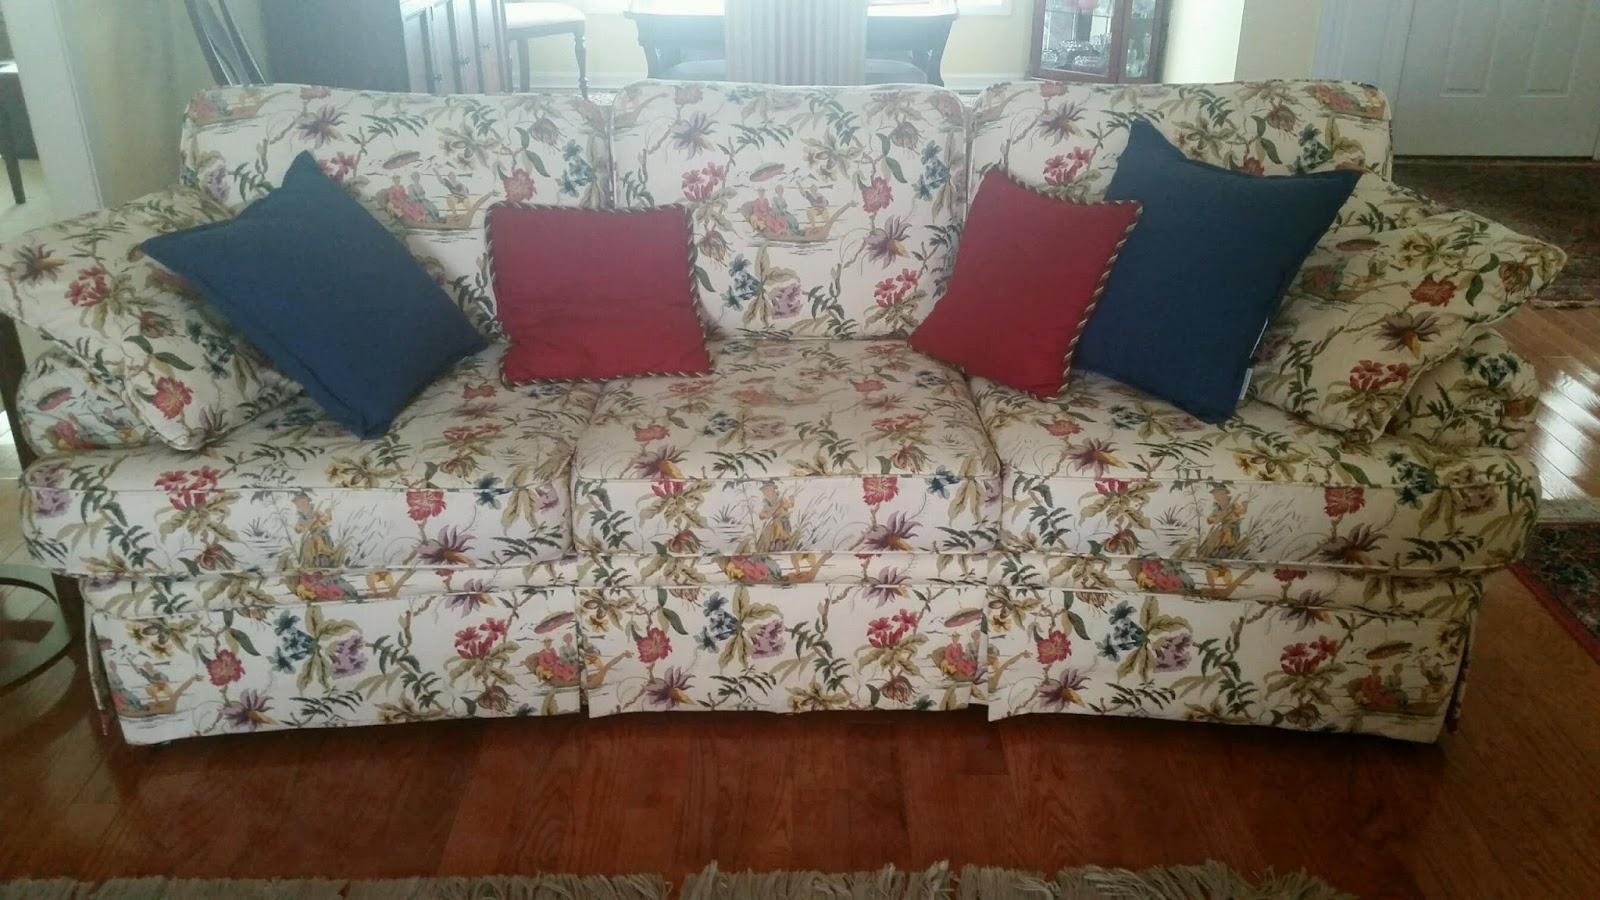 Pam Morris Sews Chunky Linen Slipcover On A Traditional Sofa Regarding Chintz Fabric Sofas (Image 12 of 15)